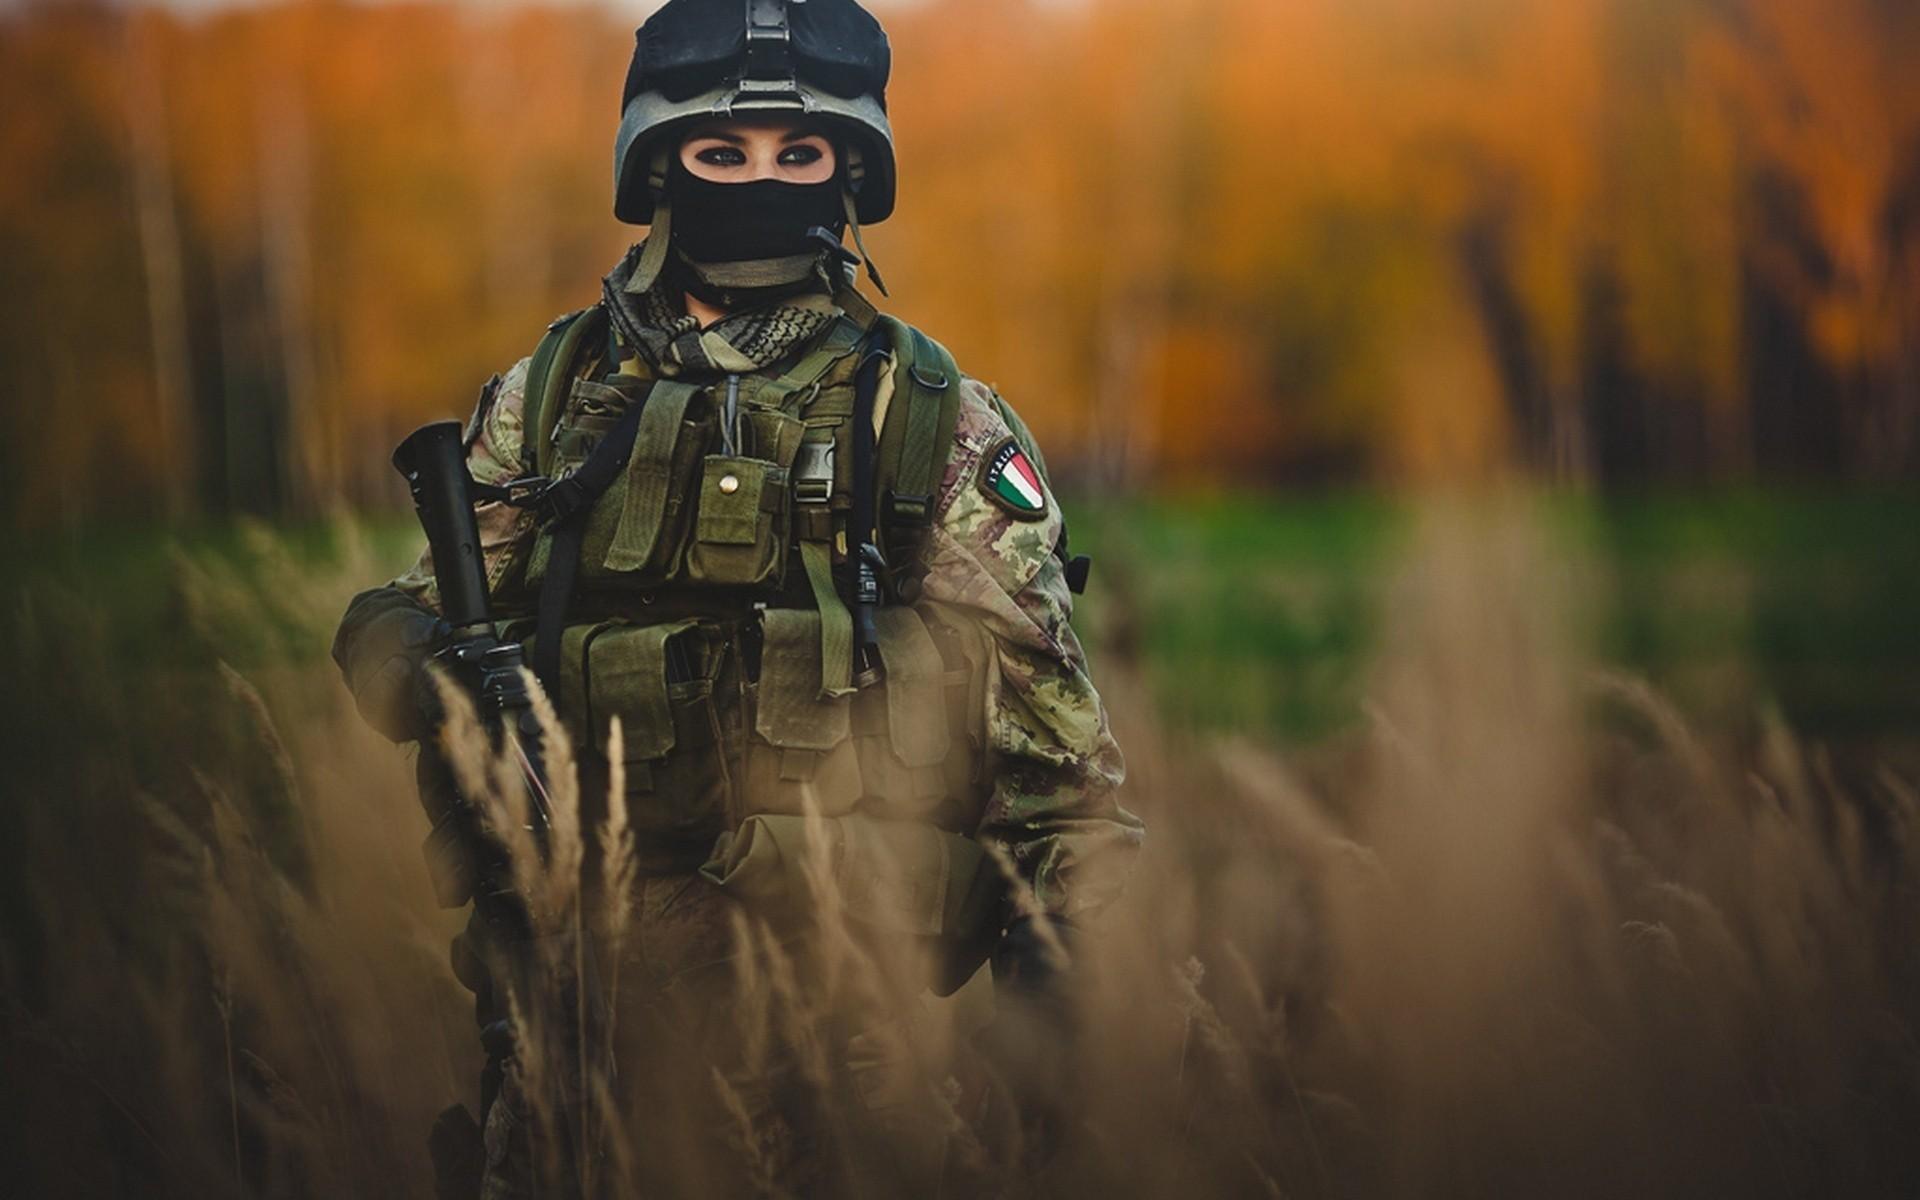 Italian Women Soldiers, grass, gun, italian, military, soldiers, woman